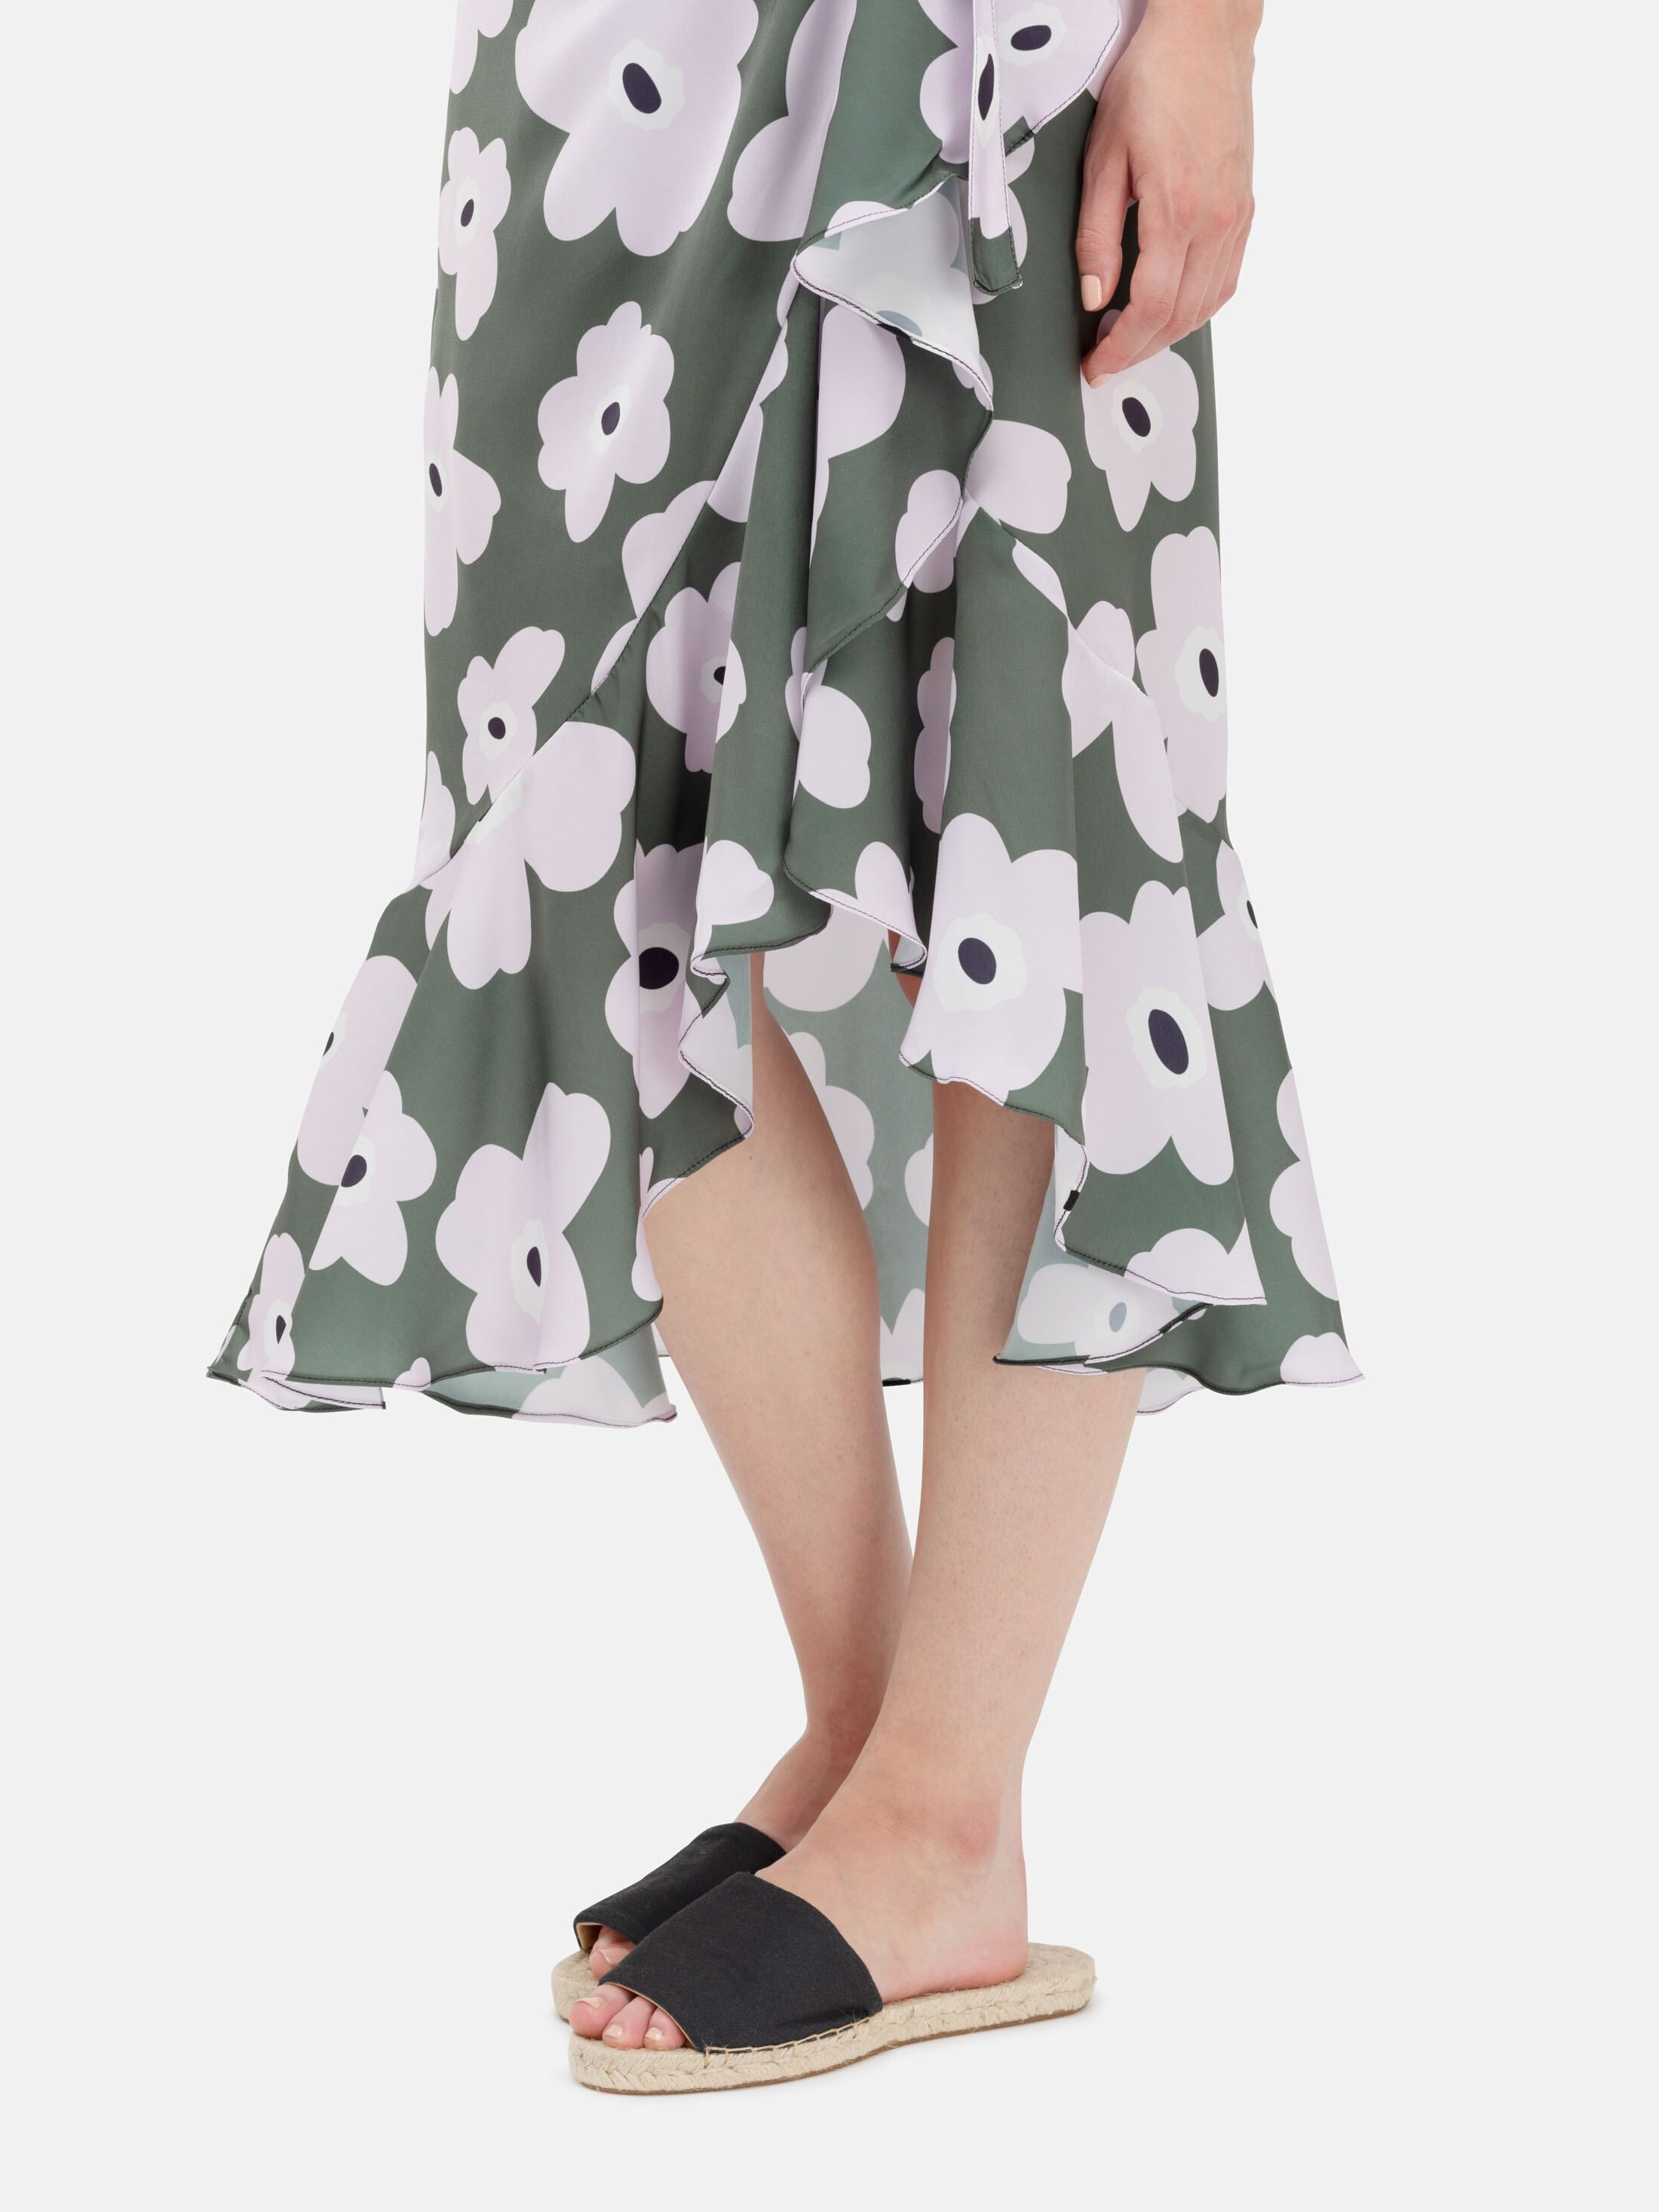 printed flounce skirt details